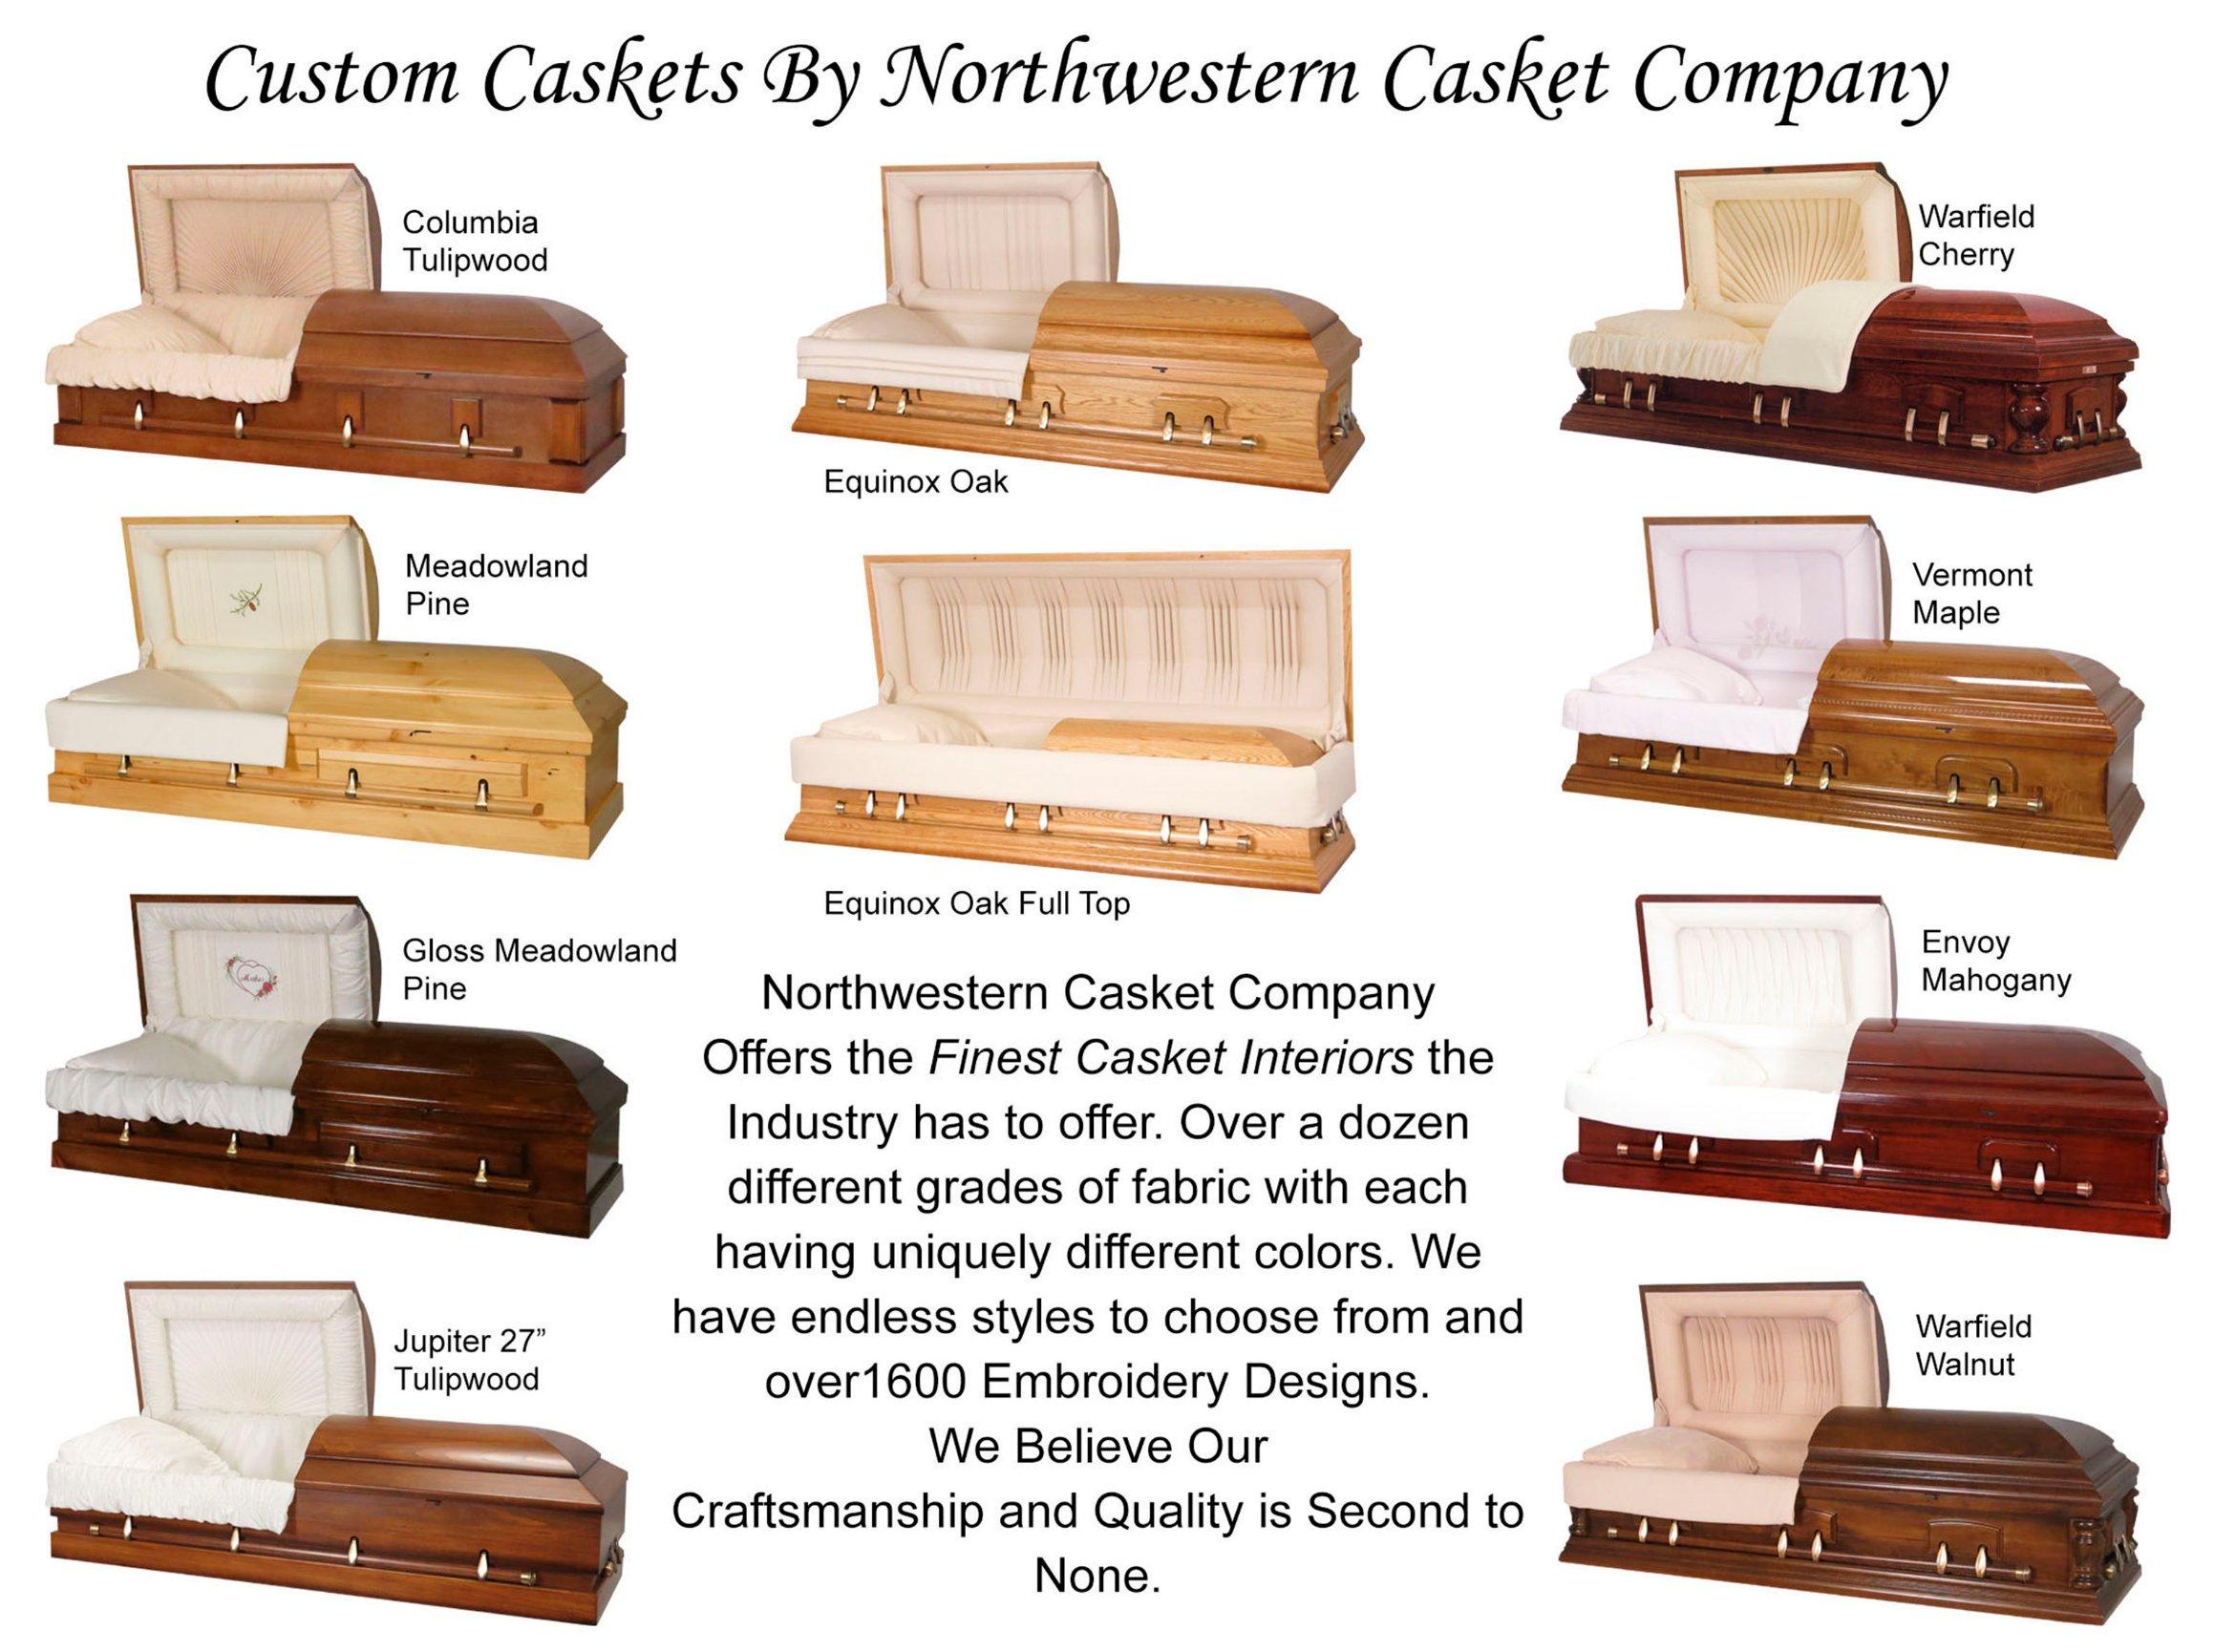 Northwestern Casket Company - Home